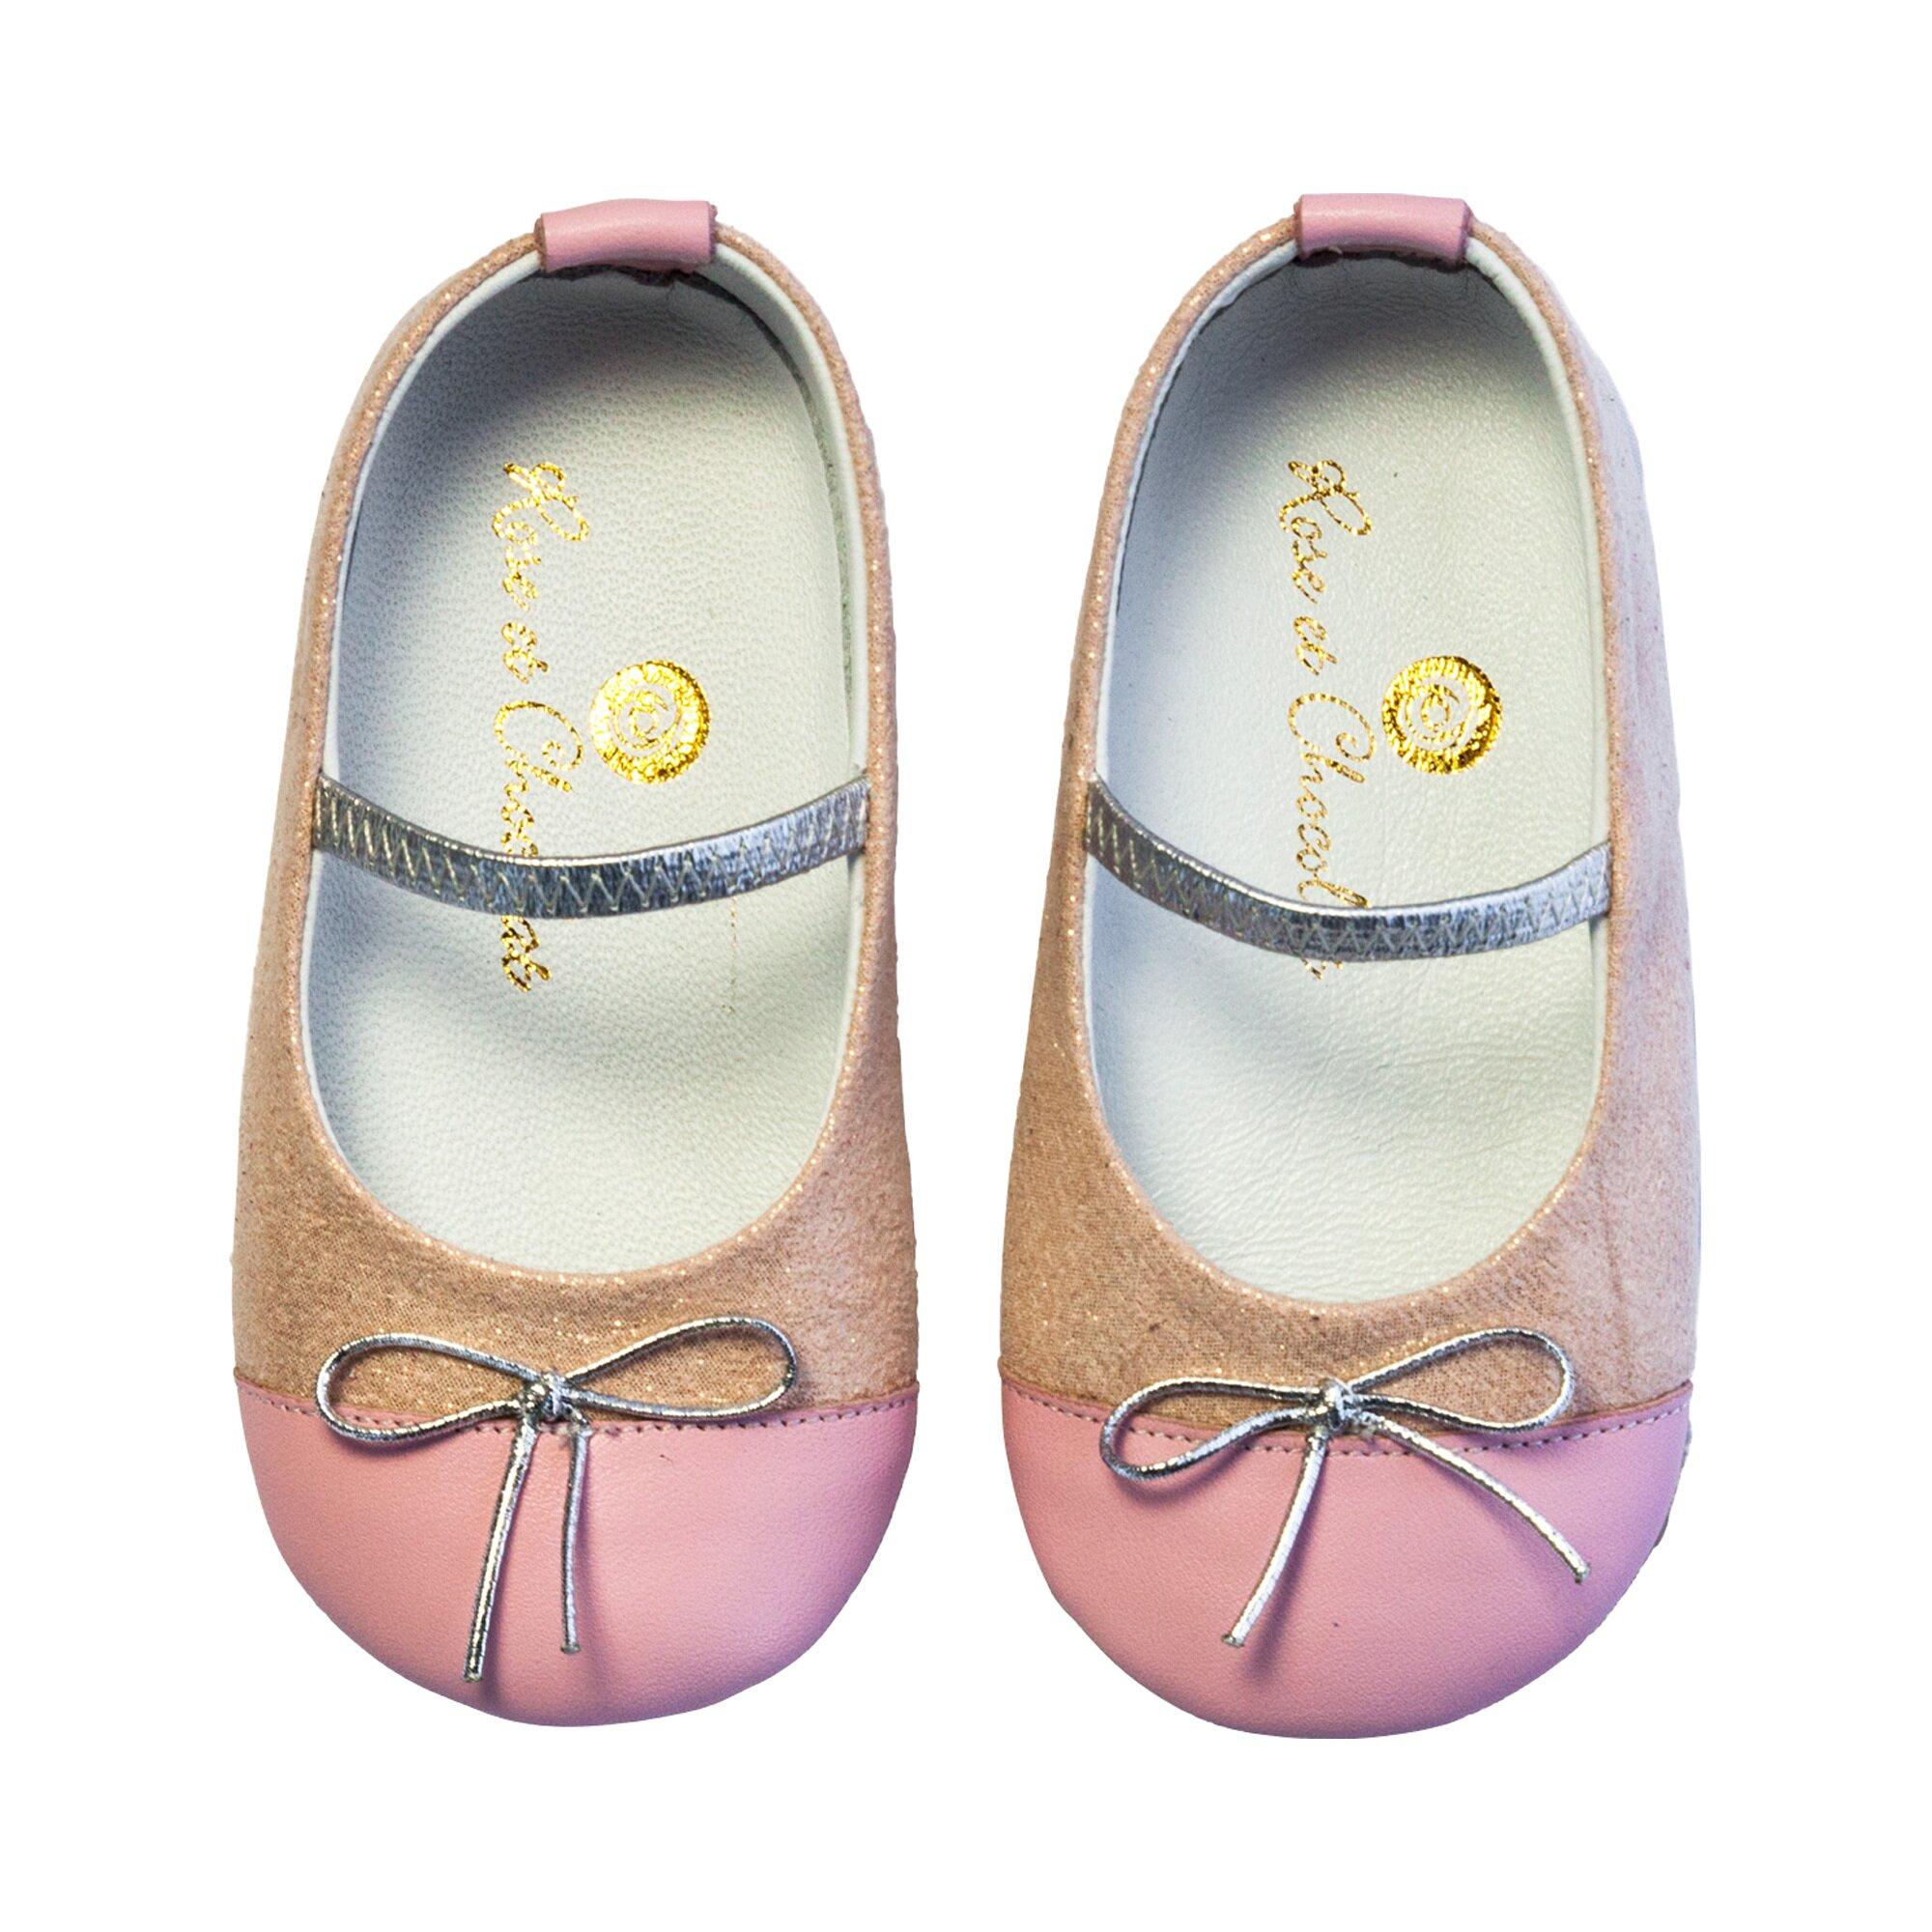 Rose Et Chocolat Ballerina Schleife